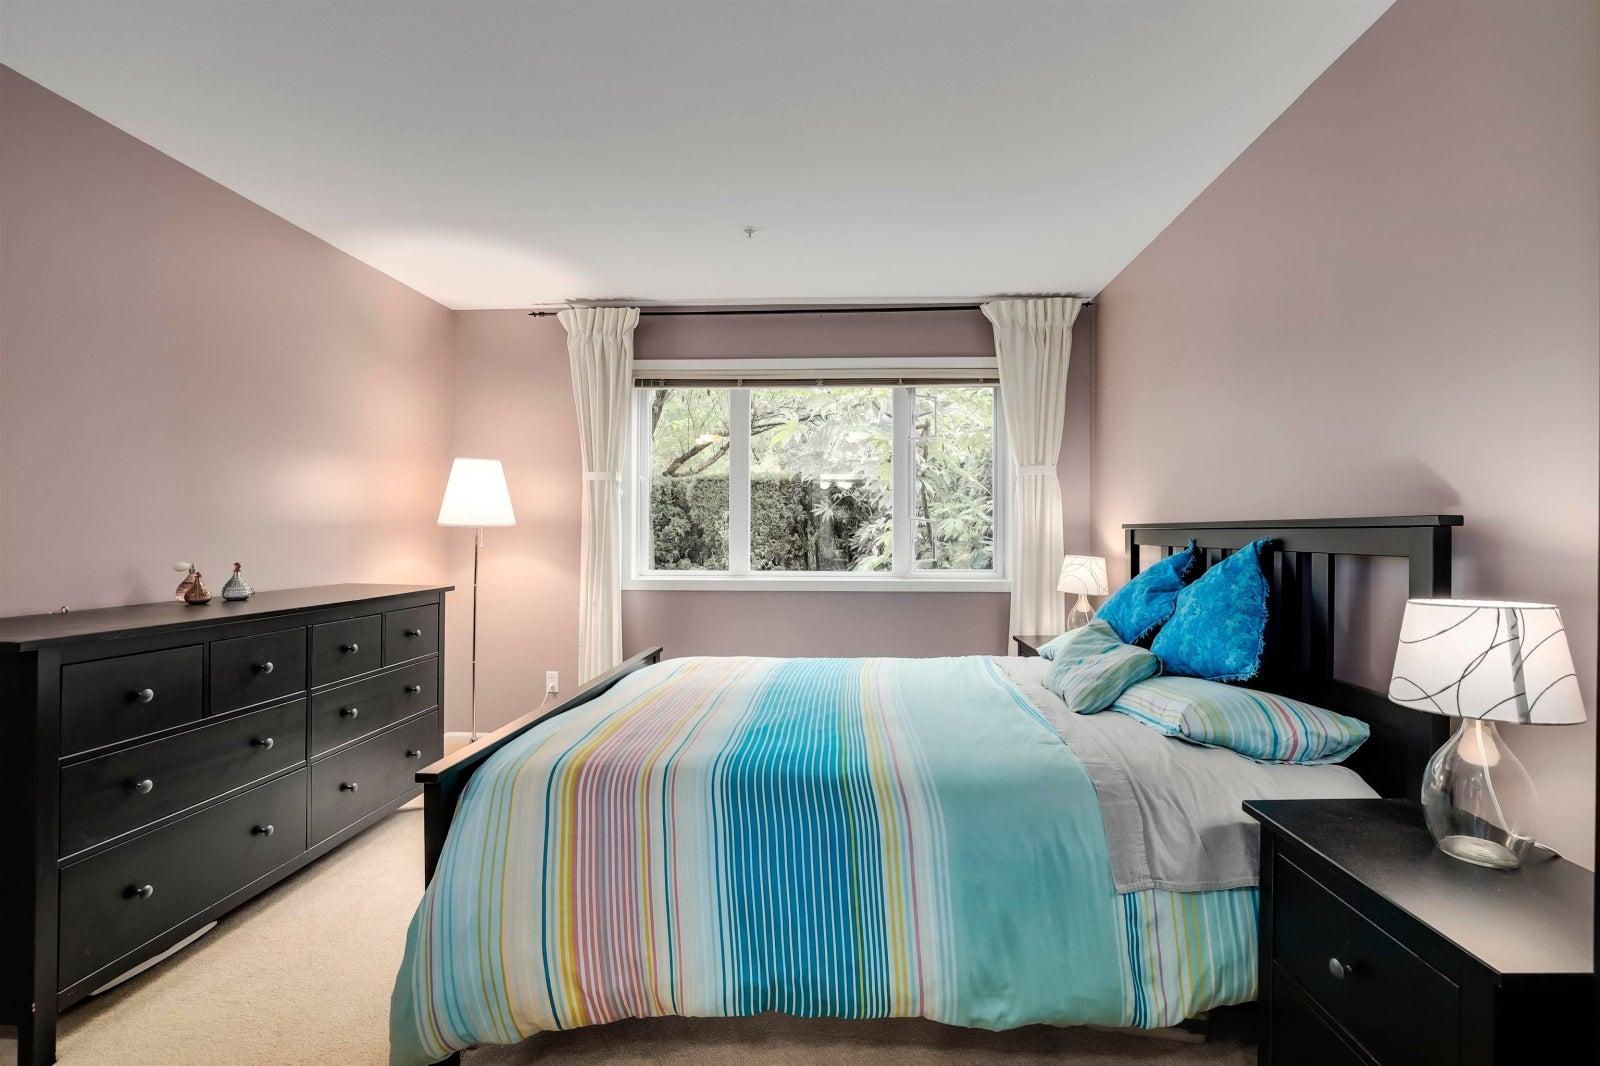 103 1132 DUFFERIN STREET - Eagle Ridge CQ Apartment/Condo for sale, 2 Bedrooms (R2618654) #16